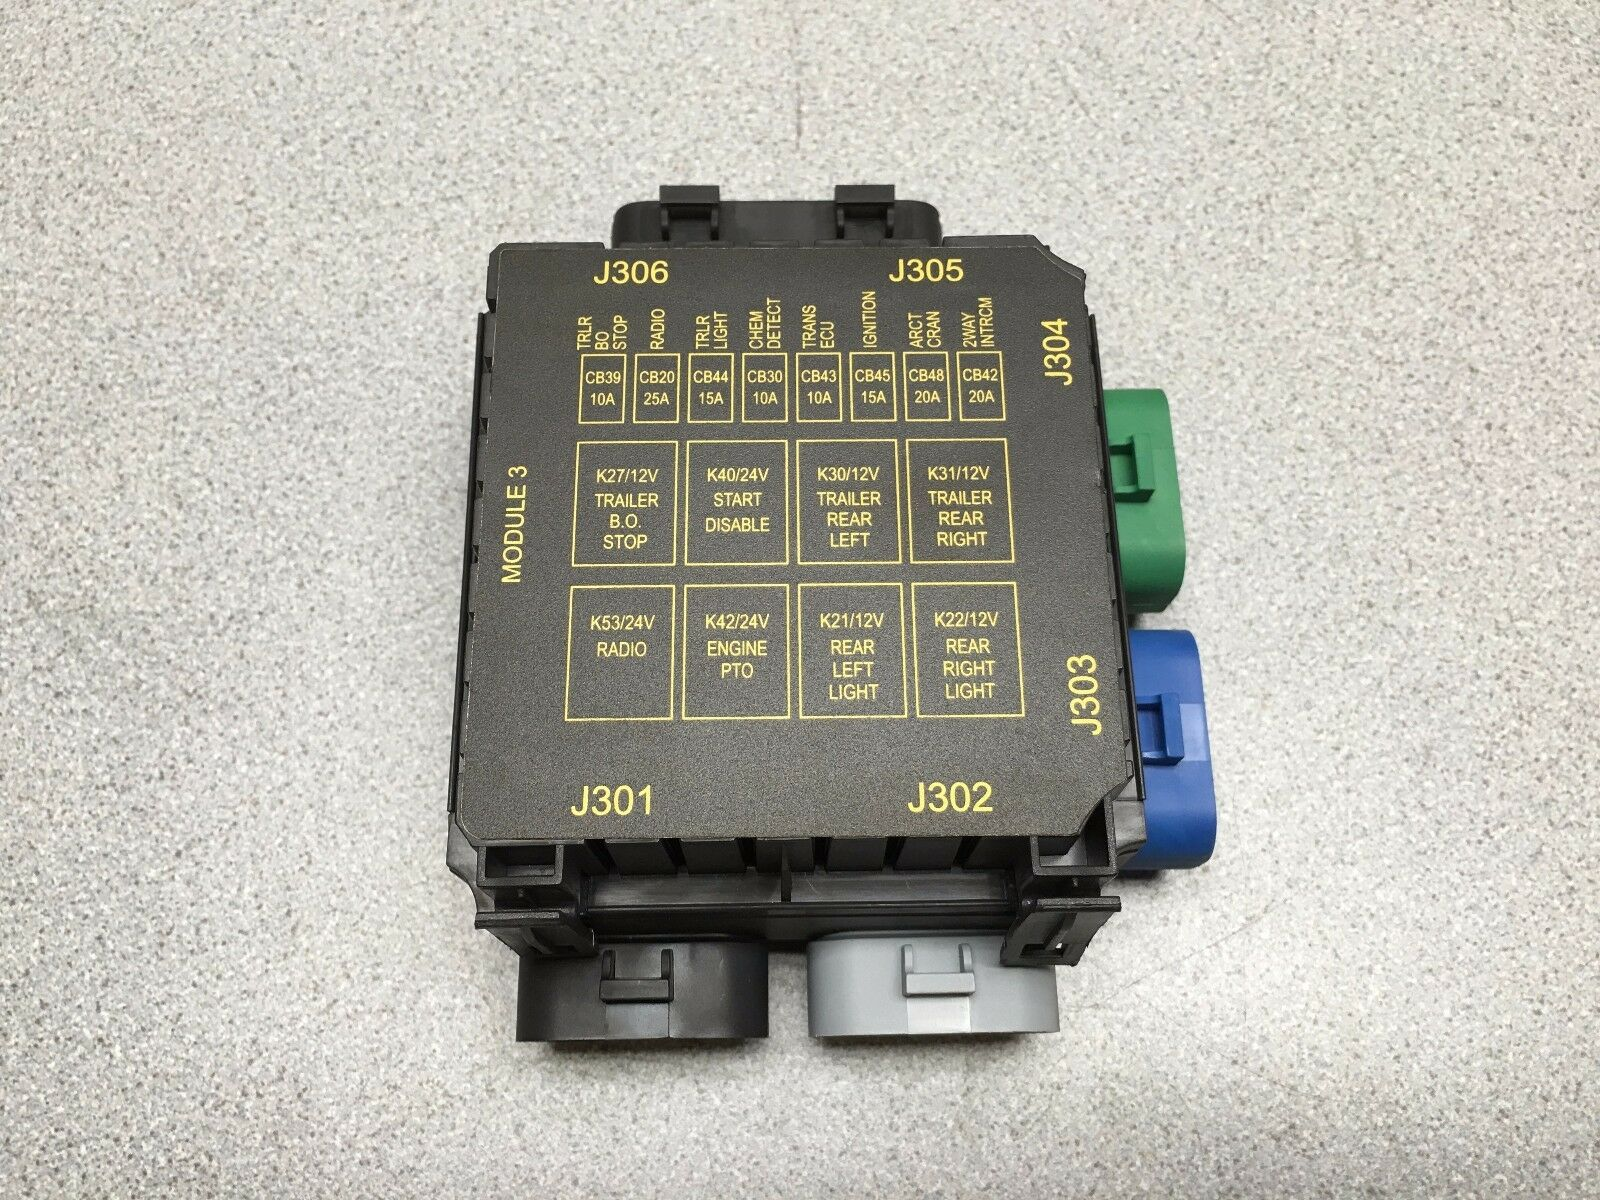 mrap fuse box wiring diagram basic mrap fuse box wiring diagram repair guides